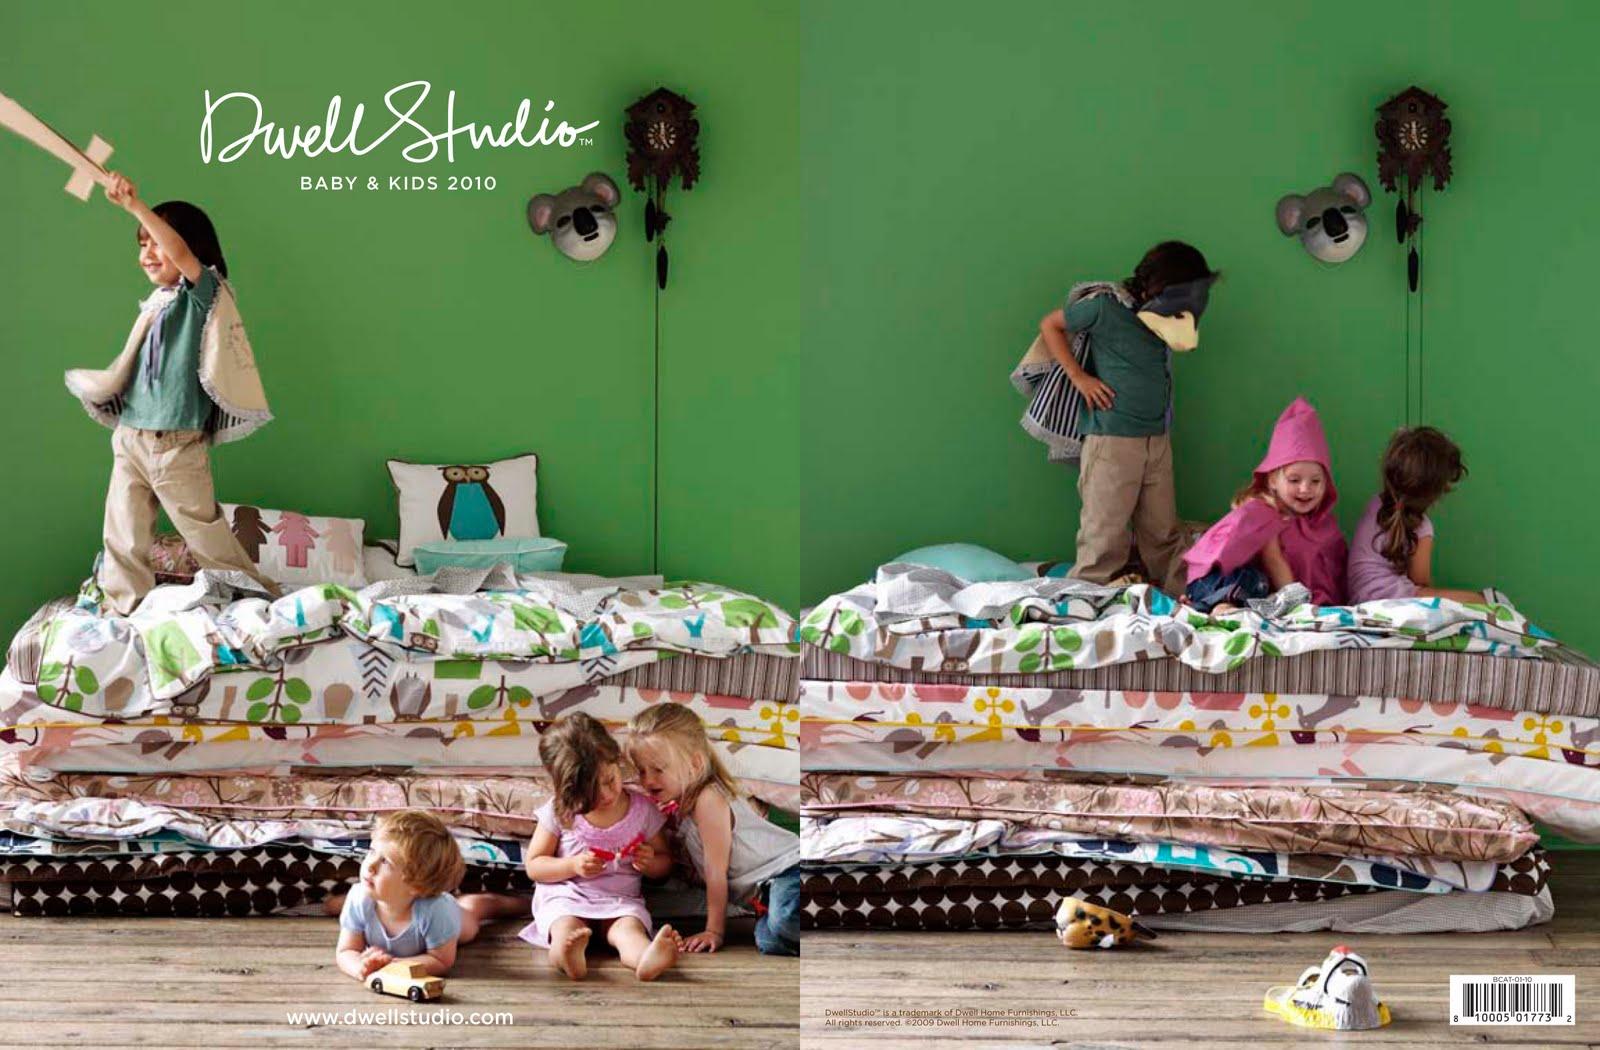 dwell baby dwell studio cribs dwell studio nursery bedding dwell  - dwell baby kids sale darling darleen a lifestyle design blog